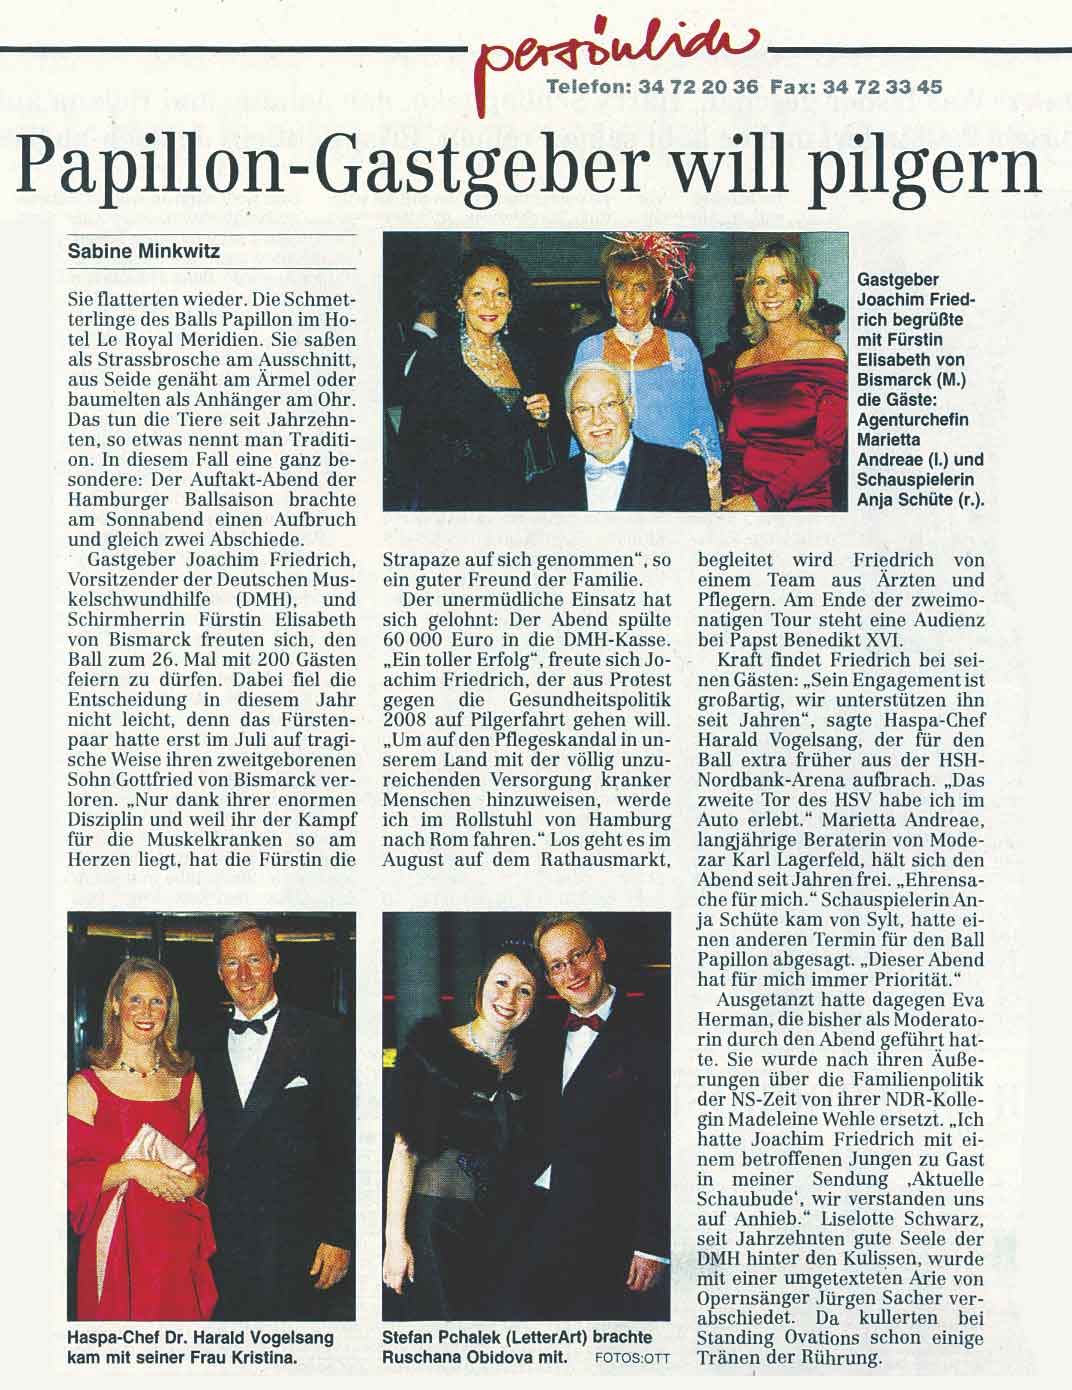 05.11.2007: Hamburger Abendblatt